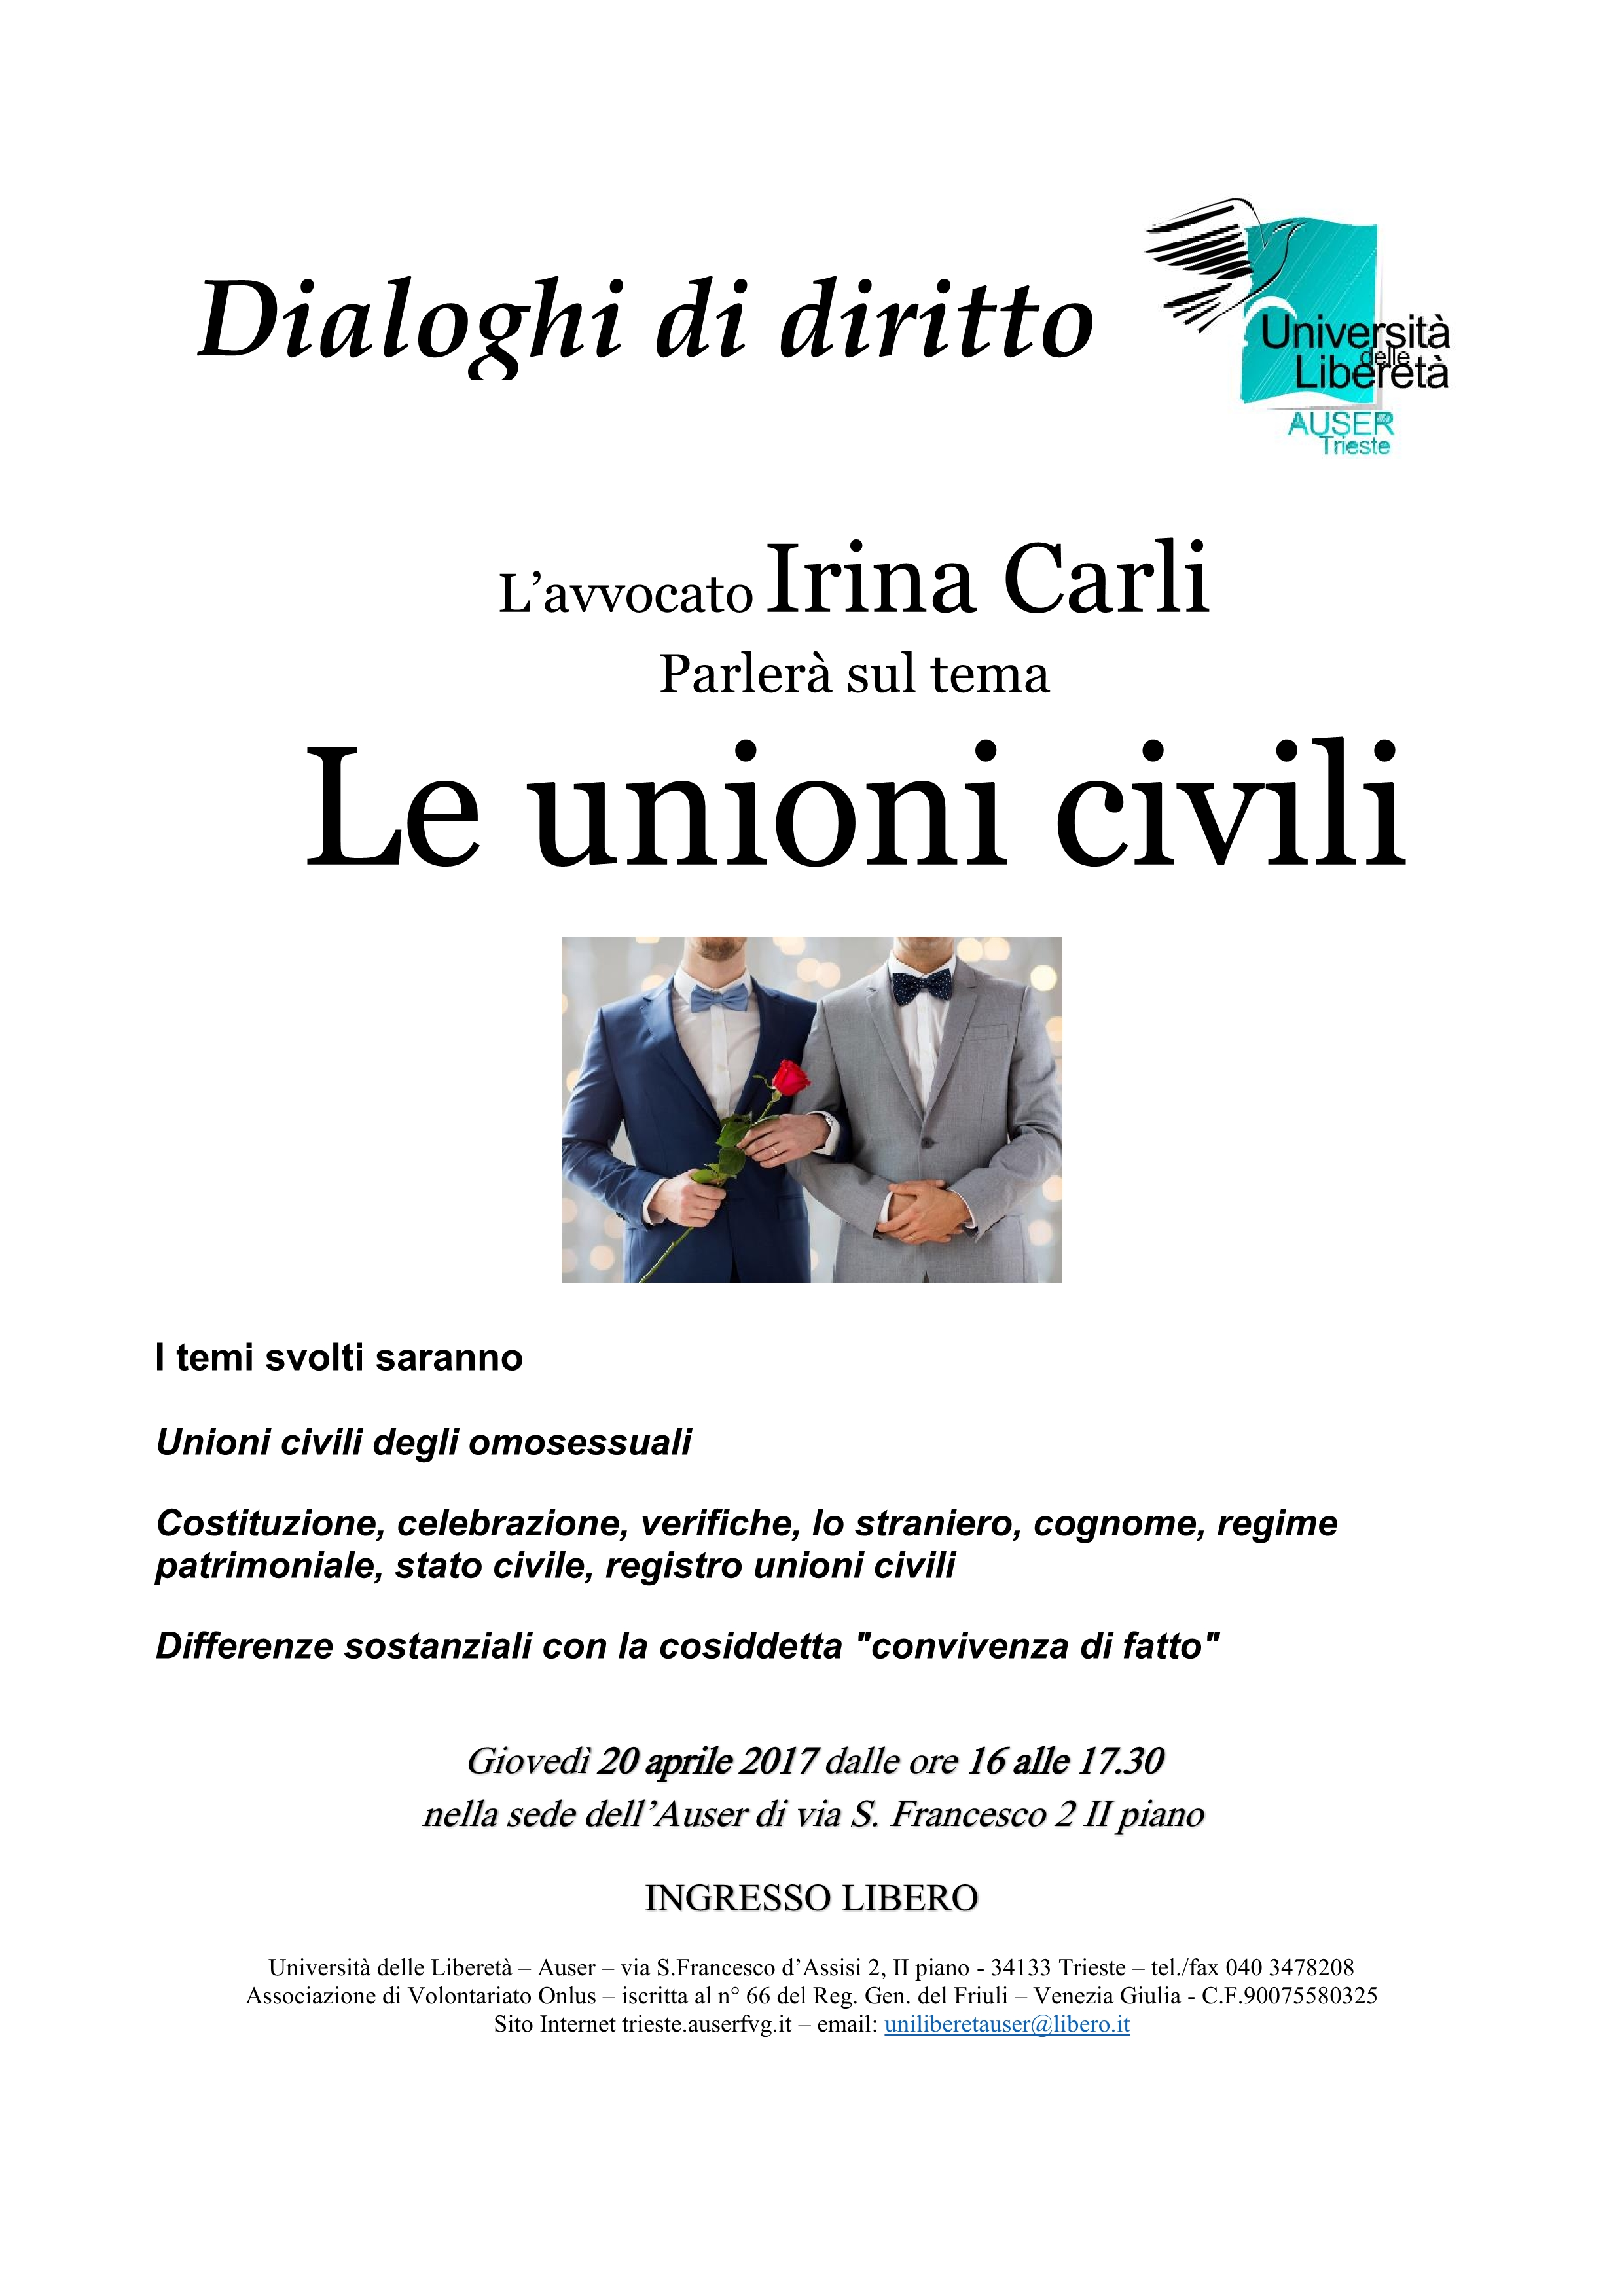 Le unioni civili II parte